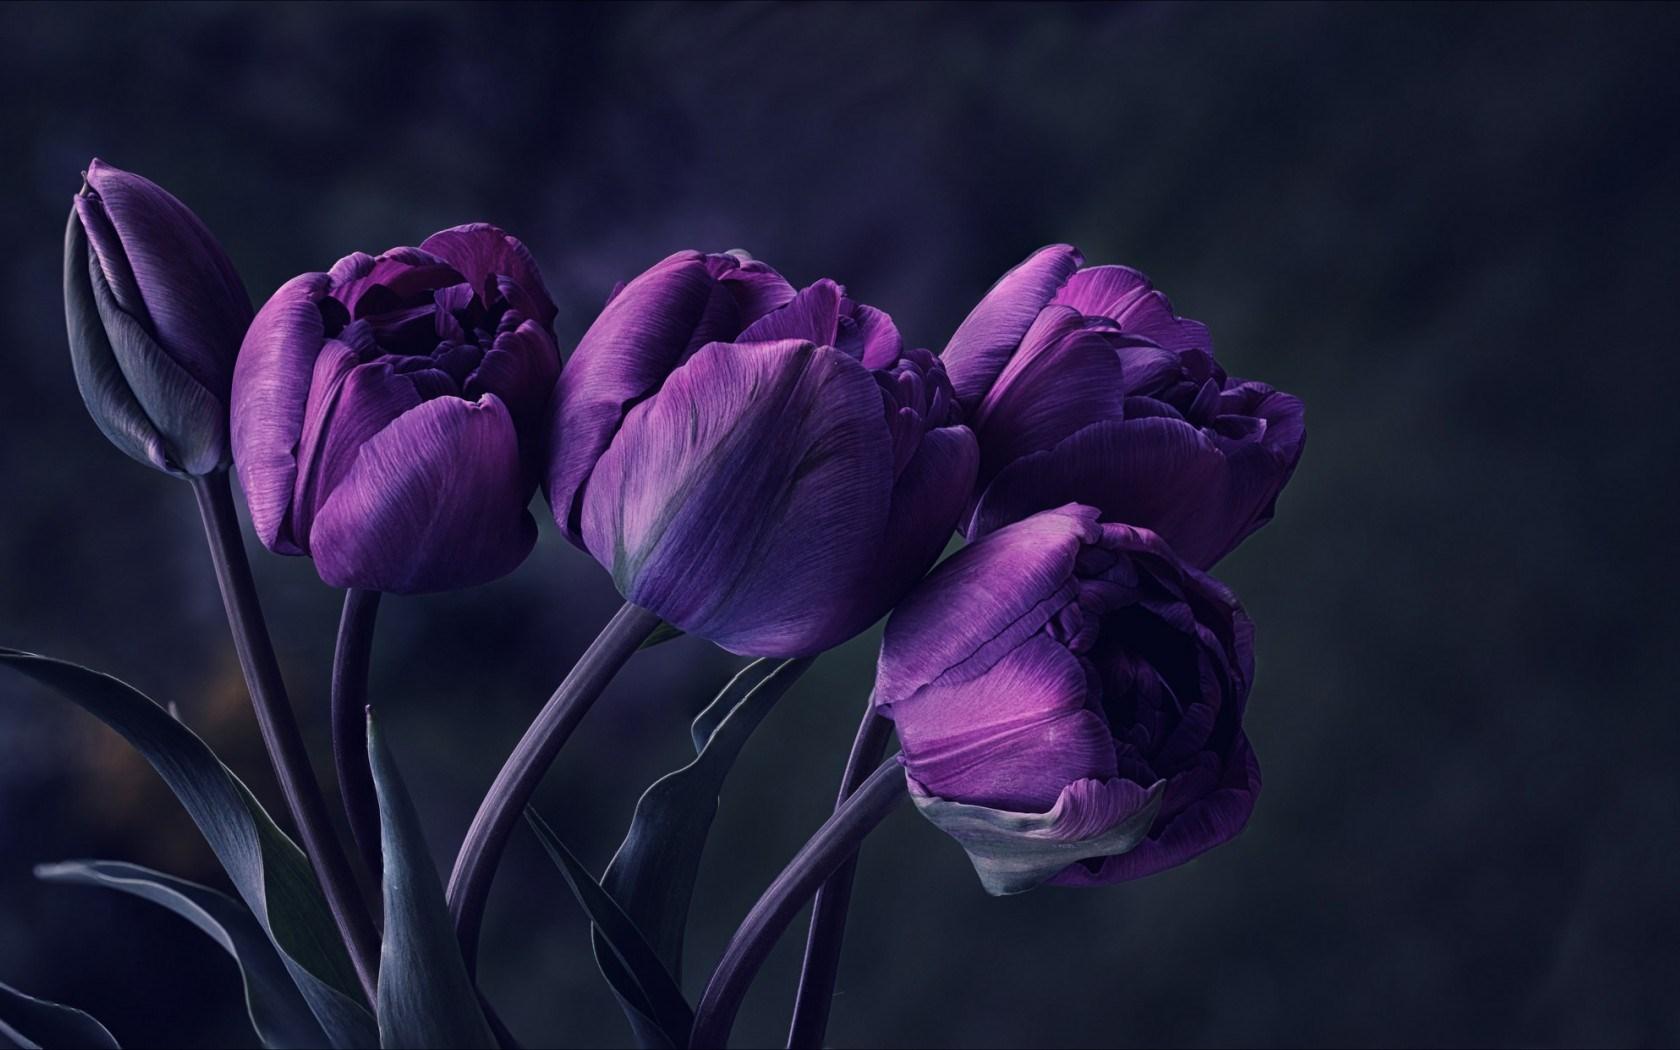 Good Wallpaper Night Flower - latest?cb\u003d20170424235110  Perfect Image Reference-718222.jpg/revision/latest?cb\u003d20170424235110